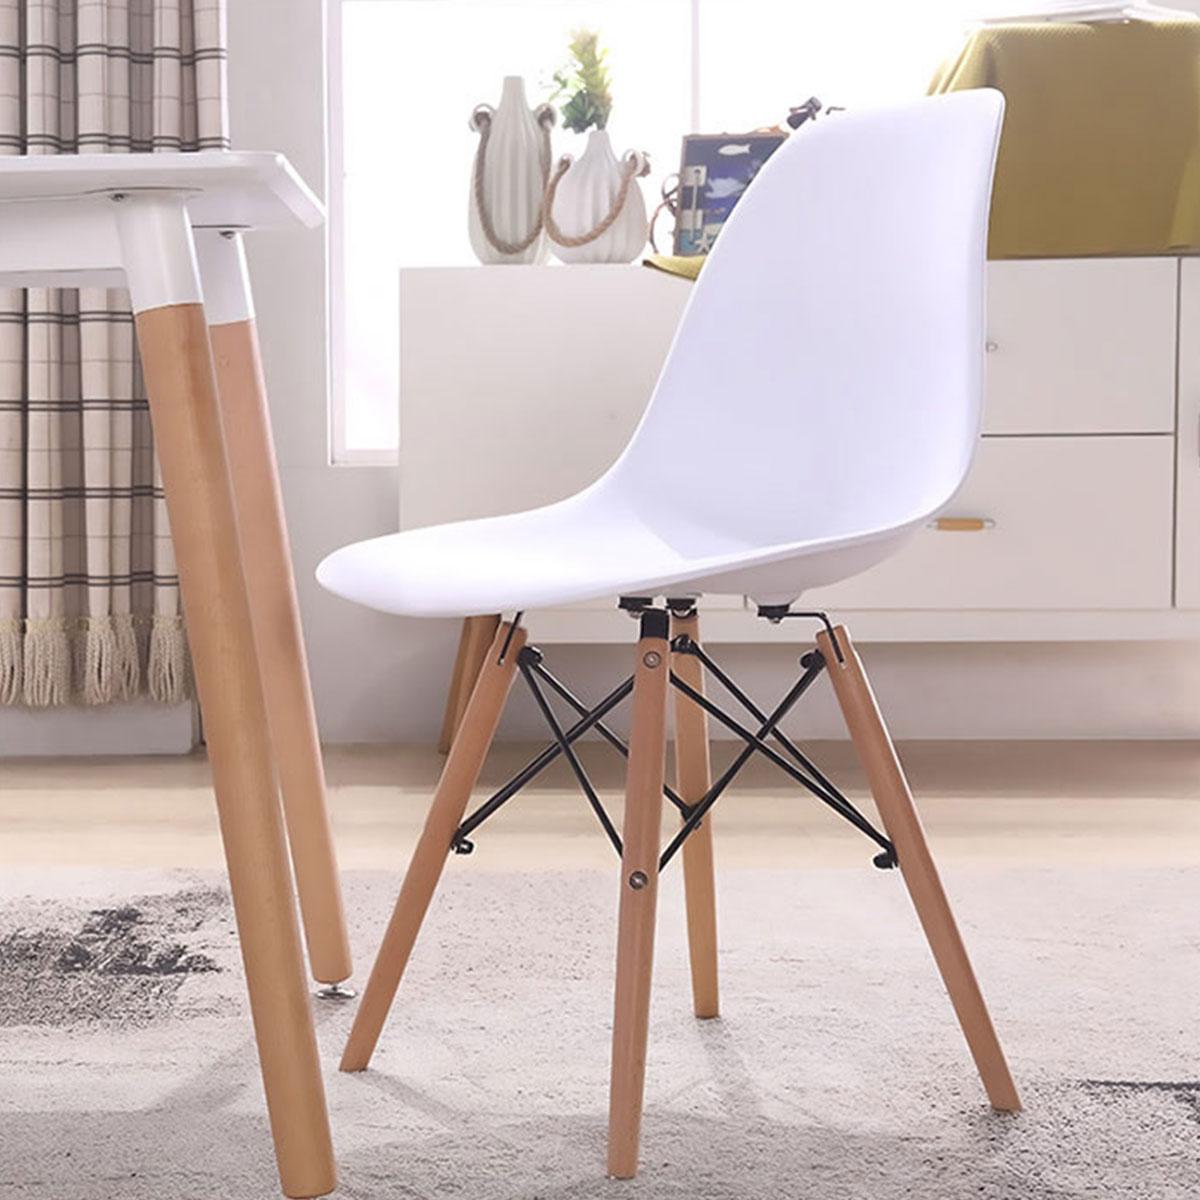 Plastična stolica bela MU19-002A